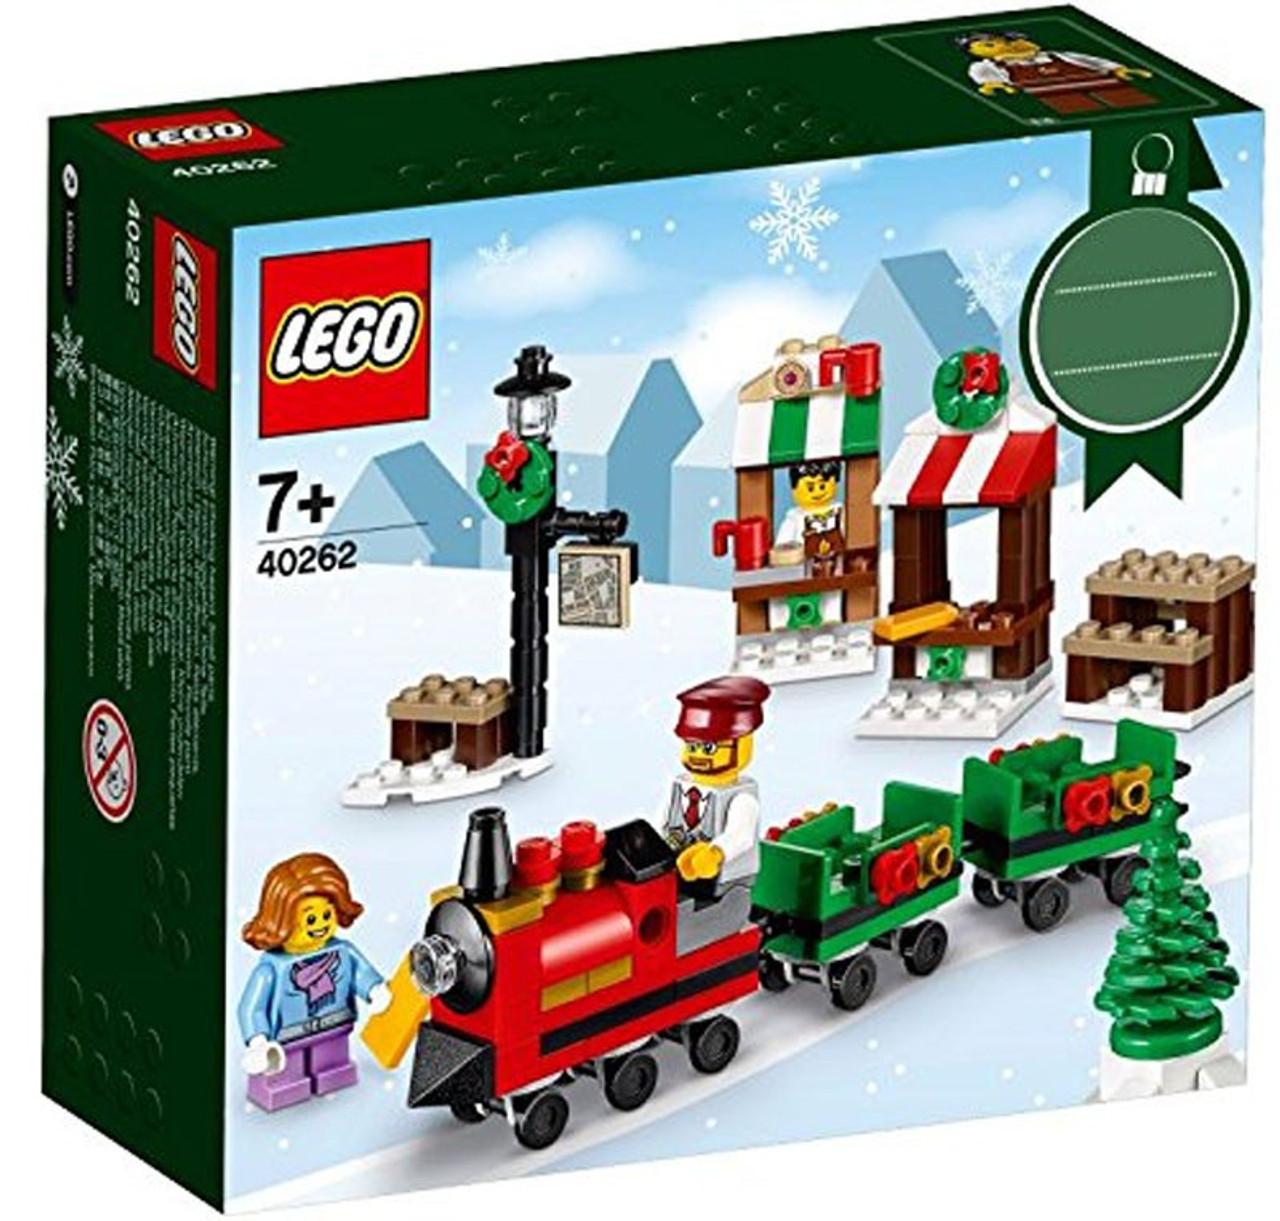 LEGO Christmas Mini Train Ride Set 40262 - ToyWiz